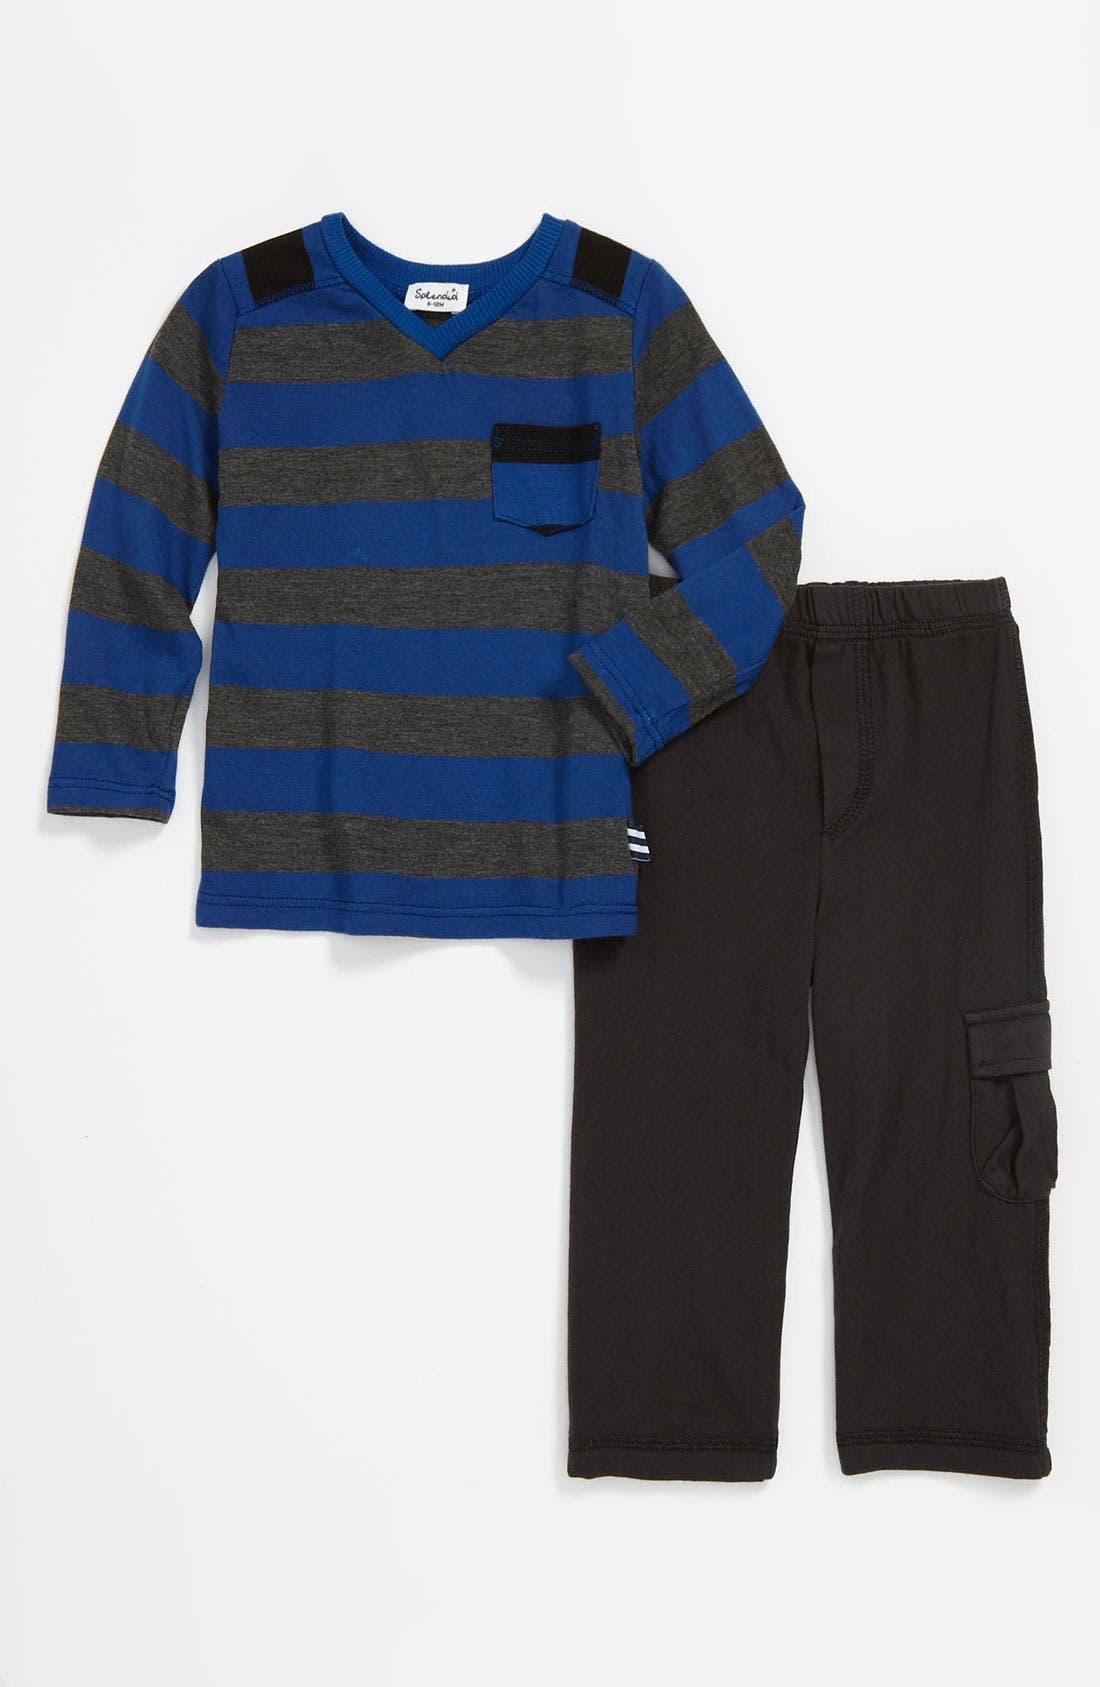 Alternate Image 1 Selected - Splendid Stripe Top & Knit Pants (Infant)